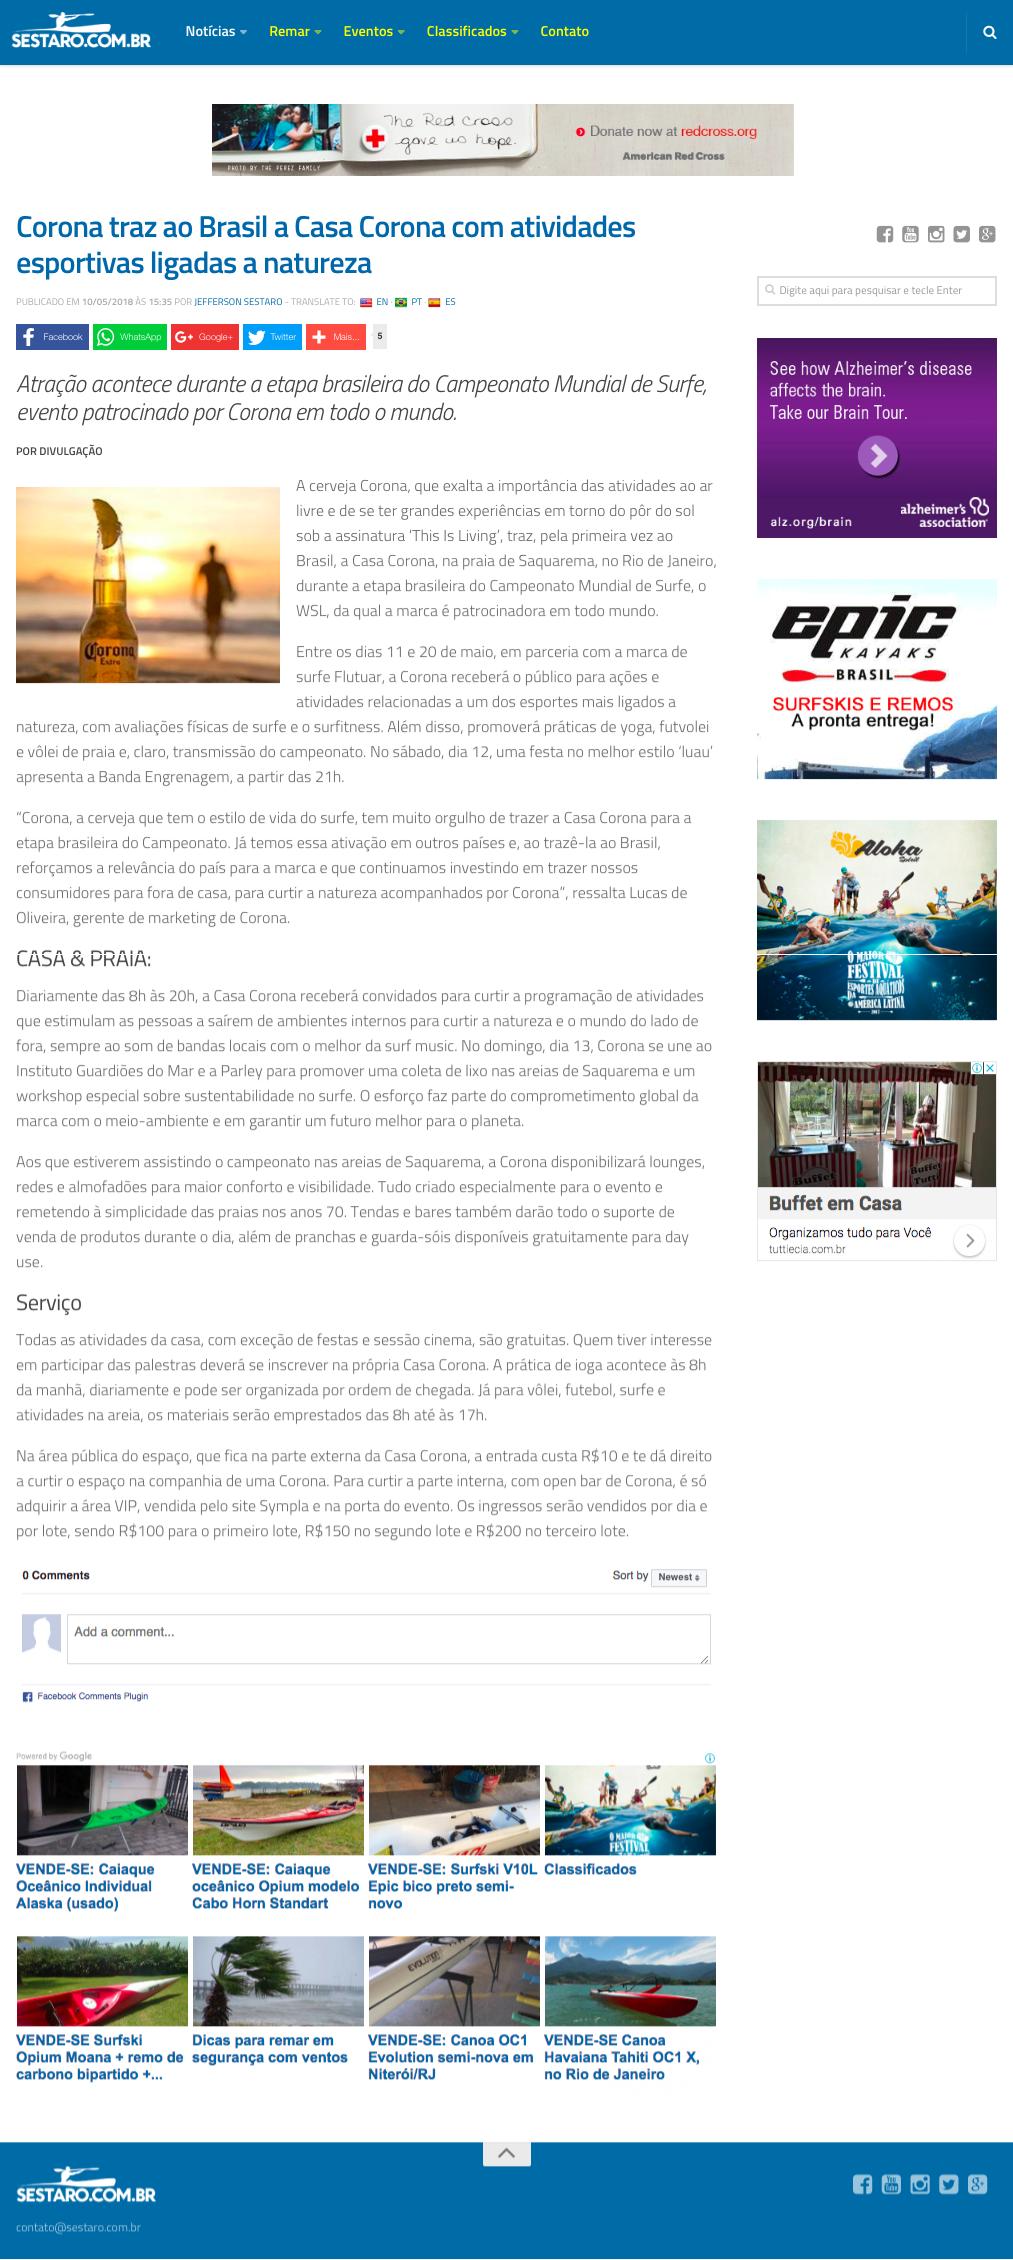 igdm guardias do marsestaro-br-casa-corona-no-brasil-2018-05-21-20_58_21.png